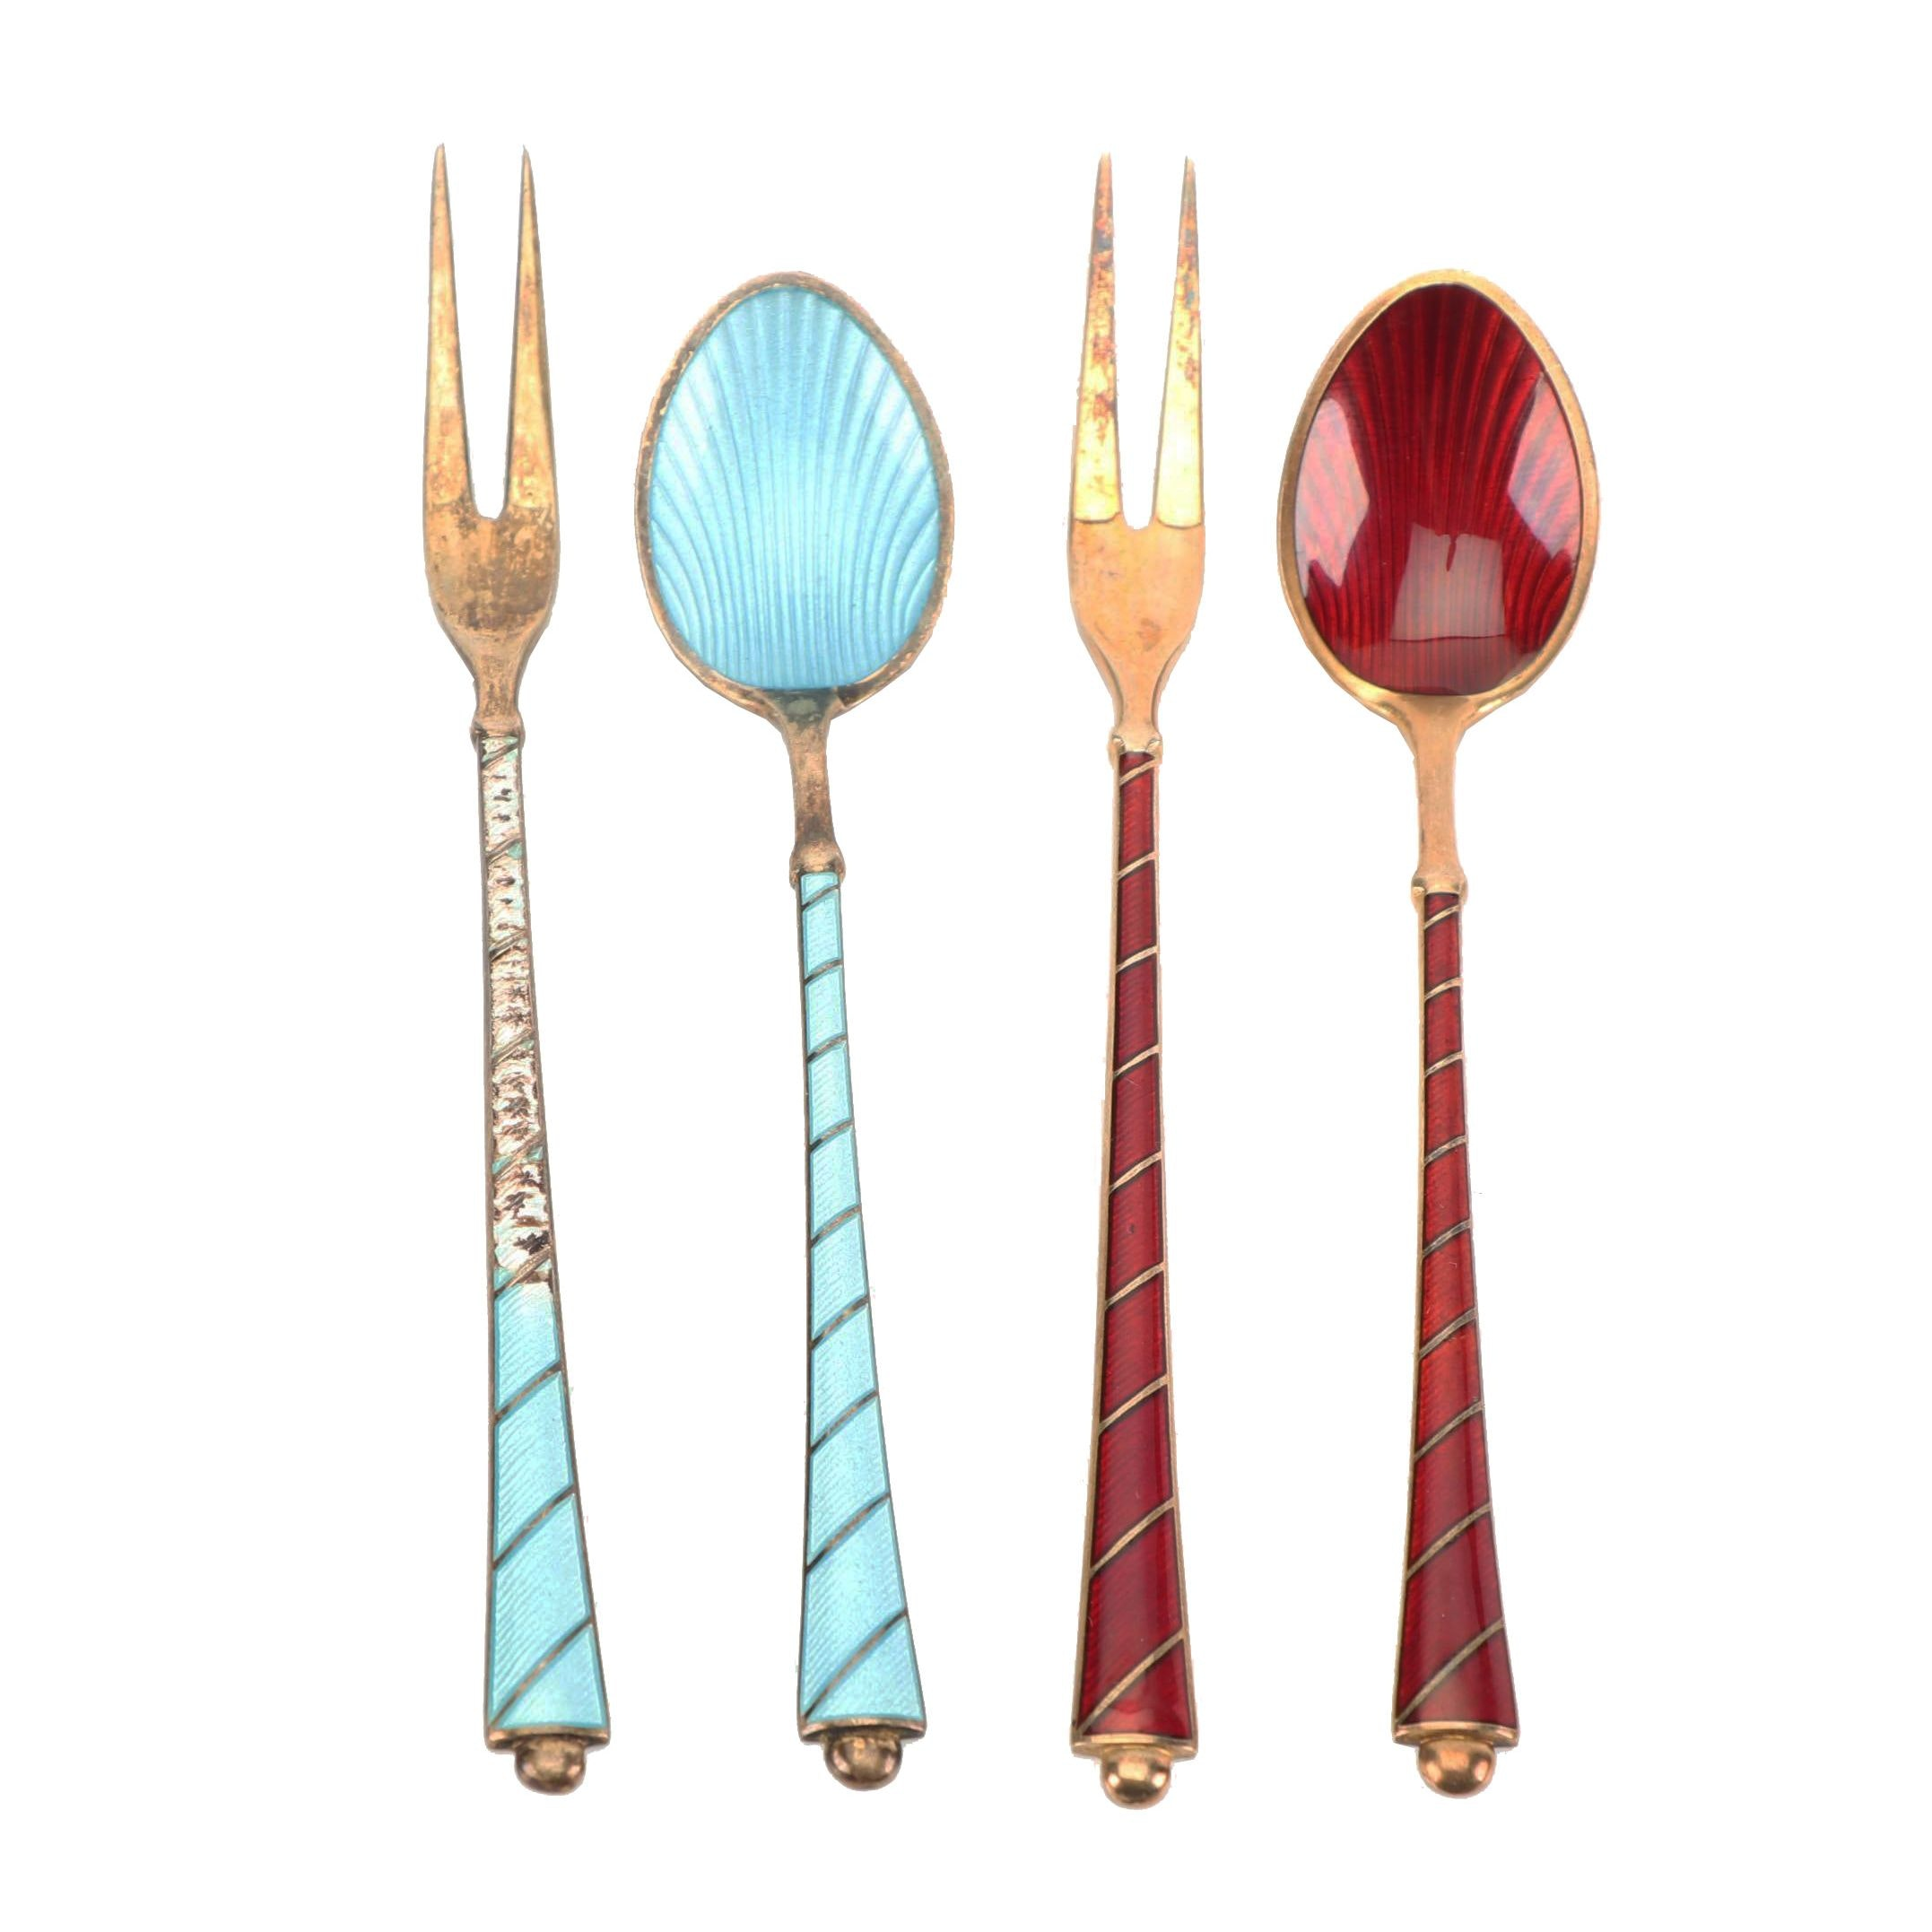 Ela Danish Guilloché Enameled Sterling Silver Demitasse Spoon and Fork Sets